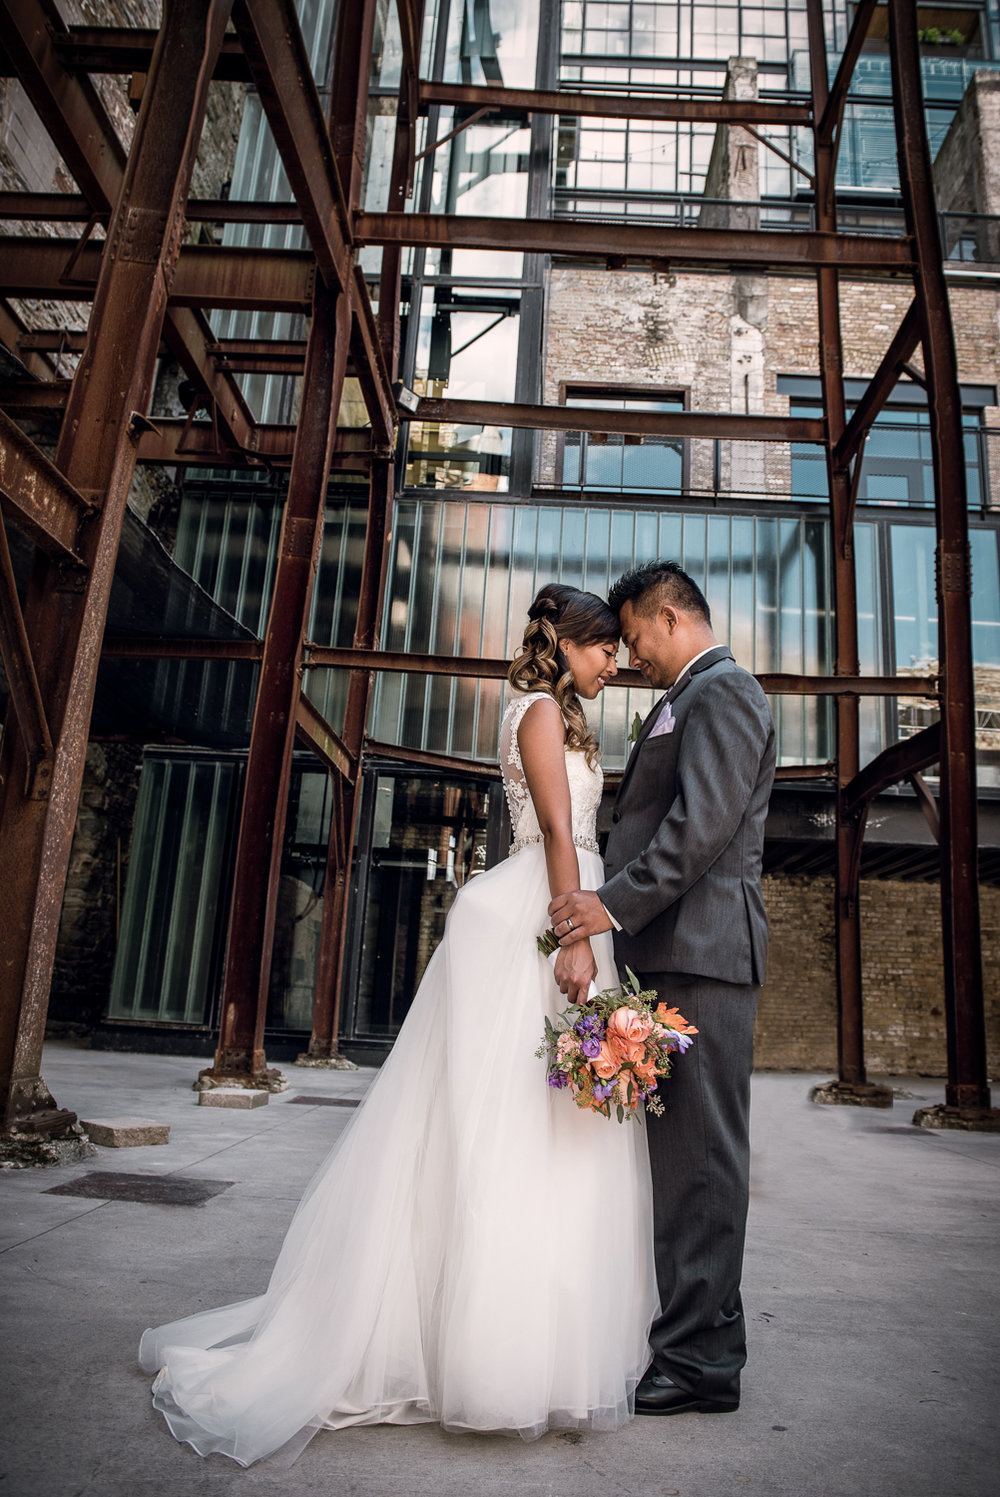 RKH Images - Best of 2016 - Minnesota Wedding Photographer -140.jpg